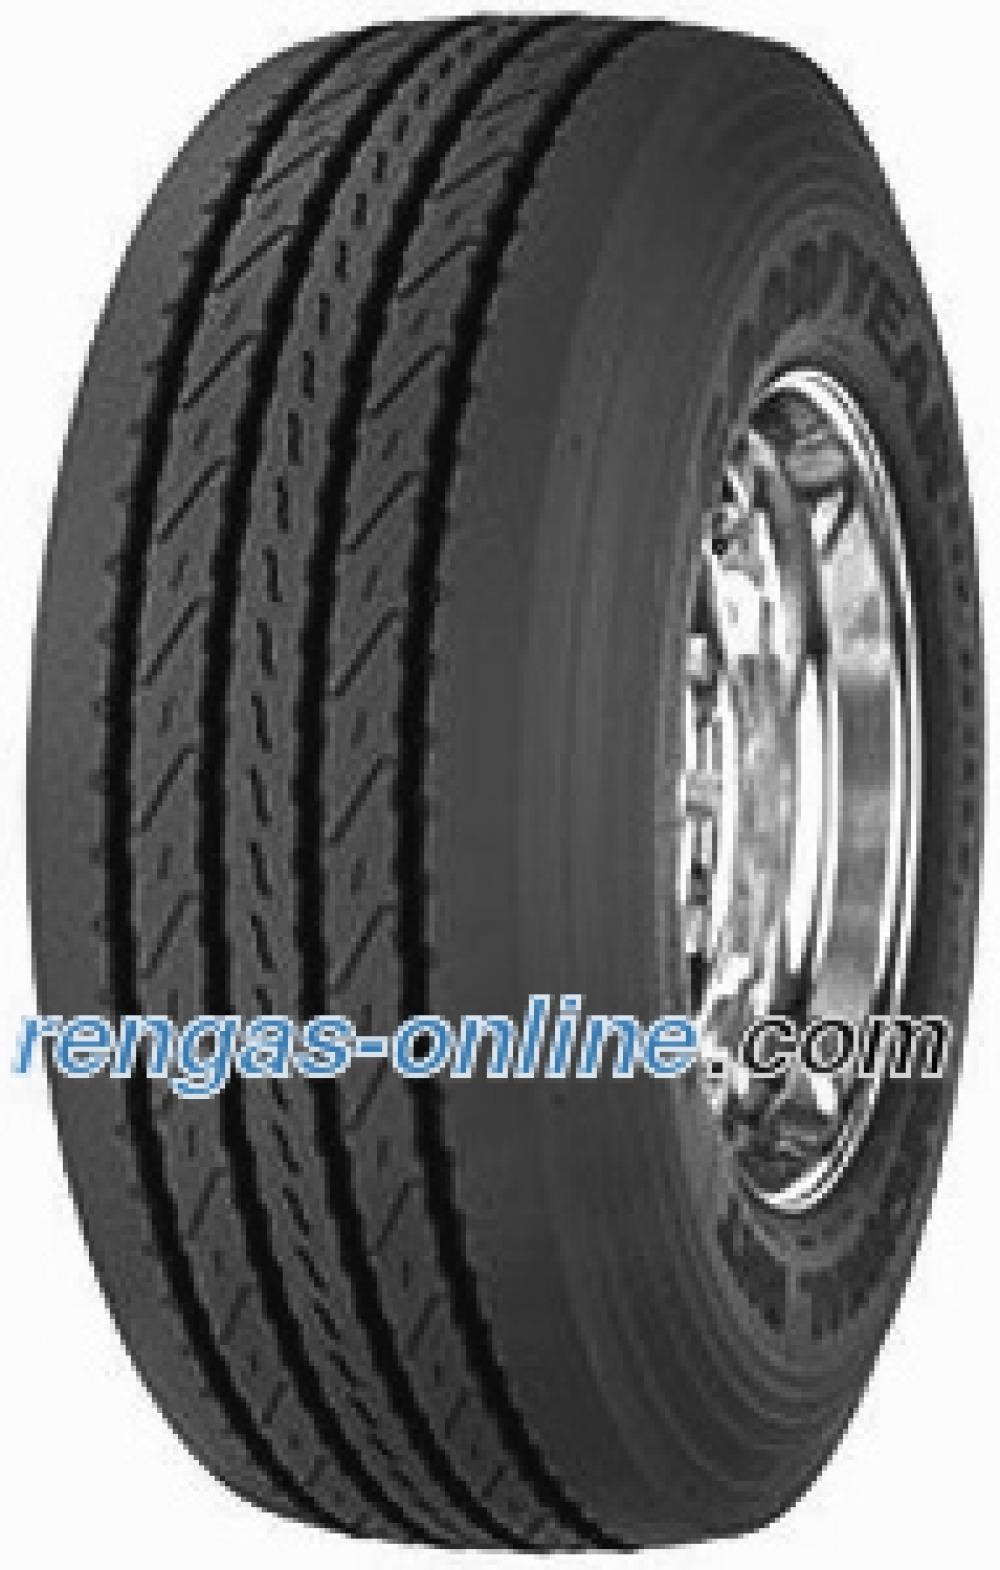 goodyear-regional-rht-750-r15-135133k-16pr